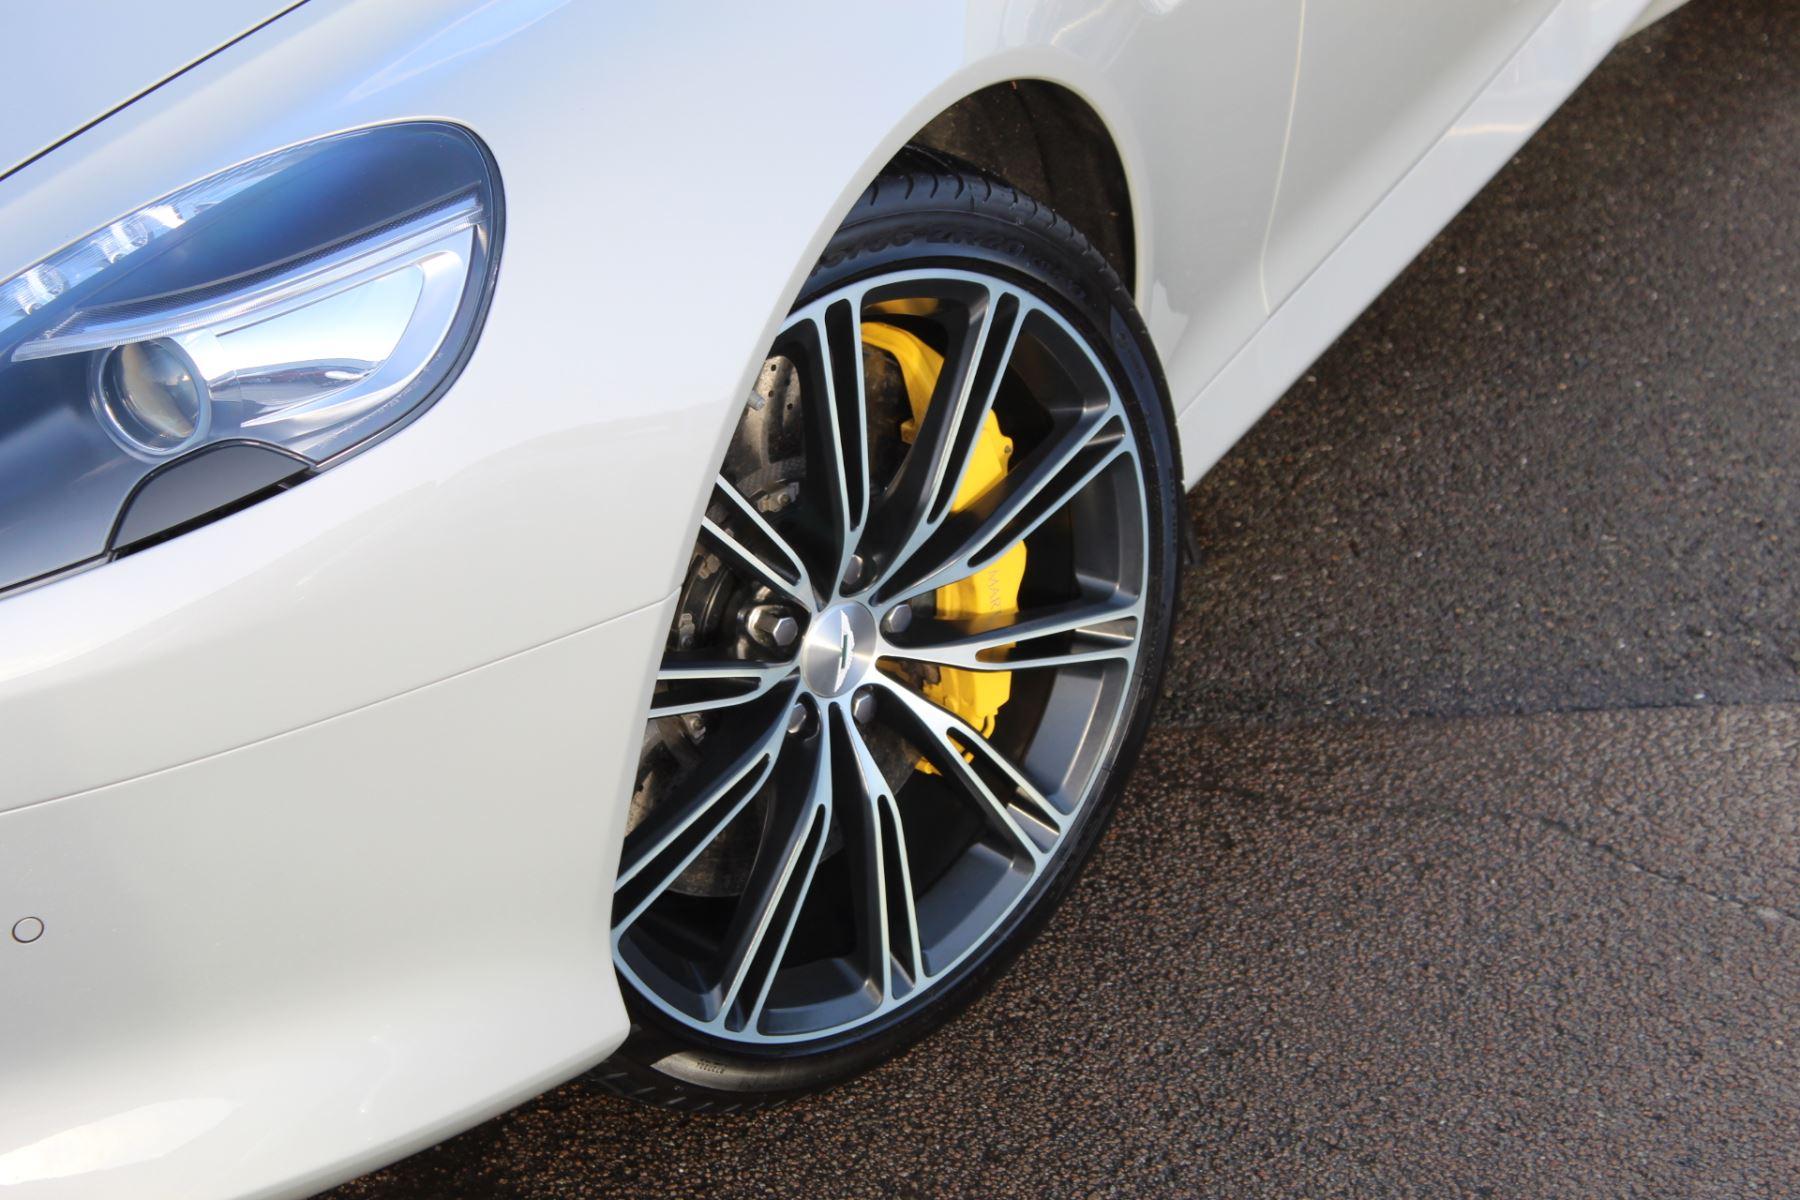 Aston Martin DB9 V12 2dr Touchtronic image 3